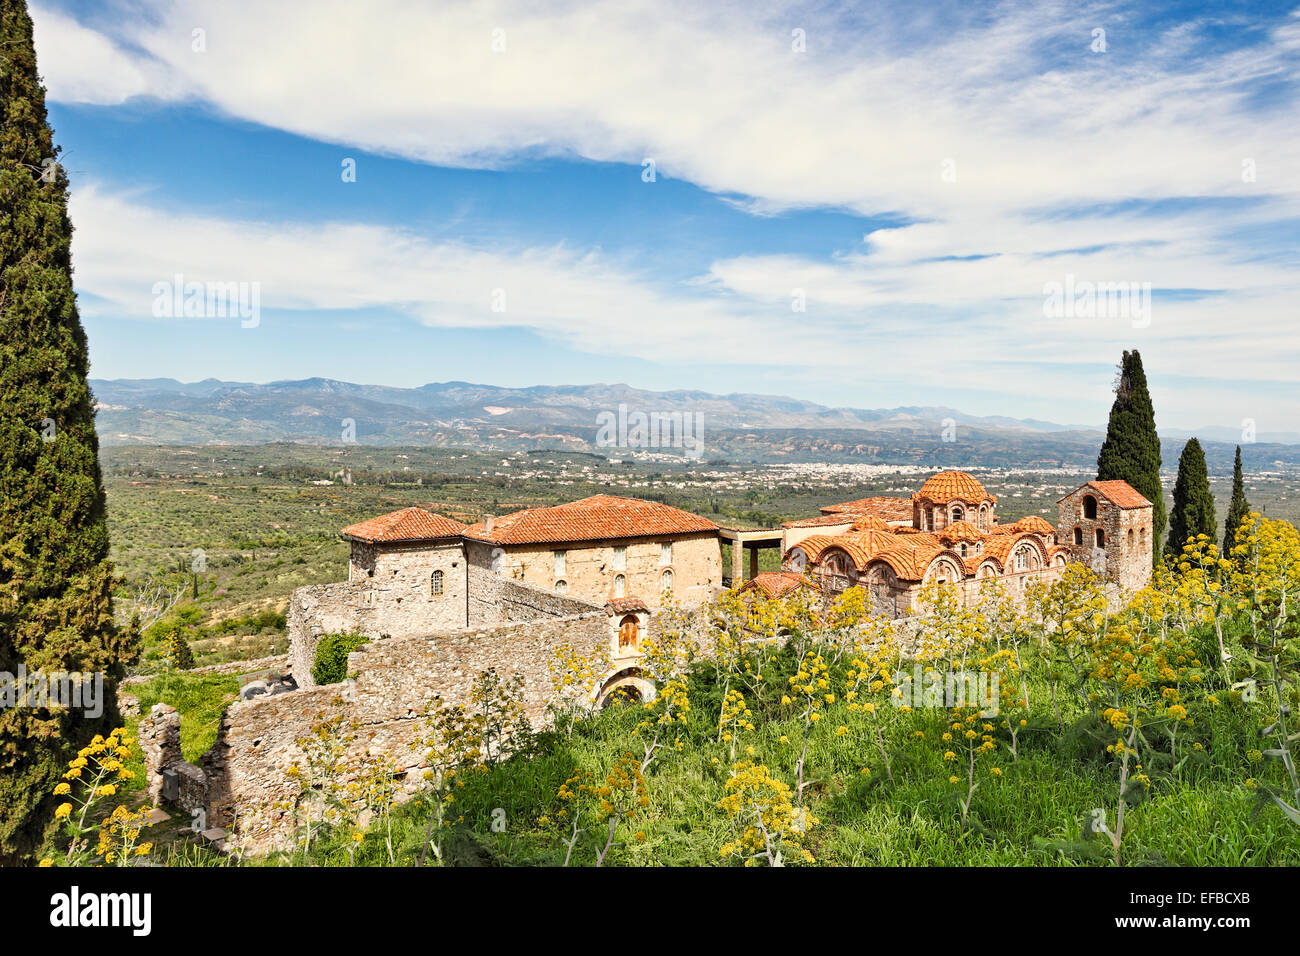 La iglesia de Saint Dimitrios (Metropolis) de Mystras, Grecia Imagen De Stock